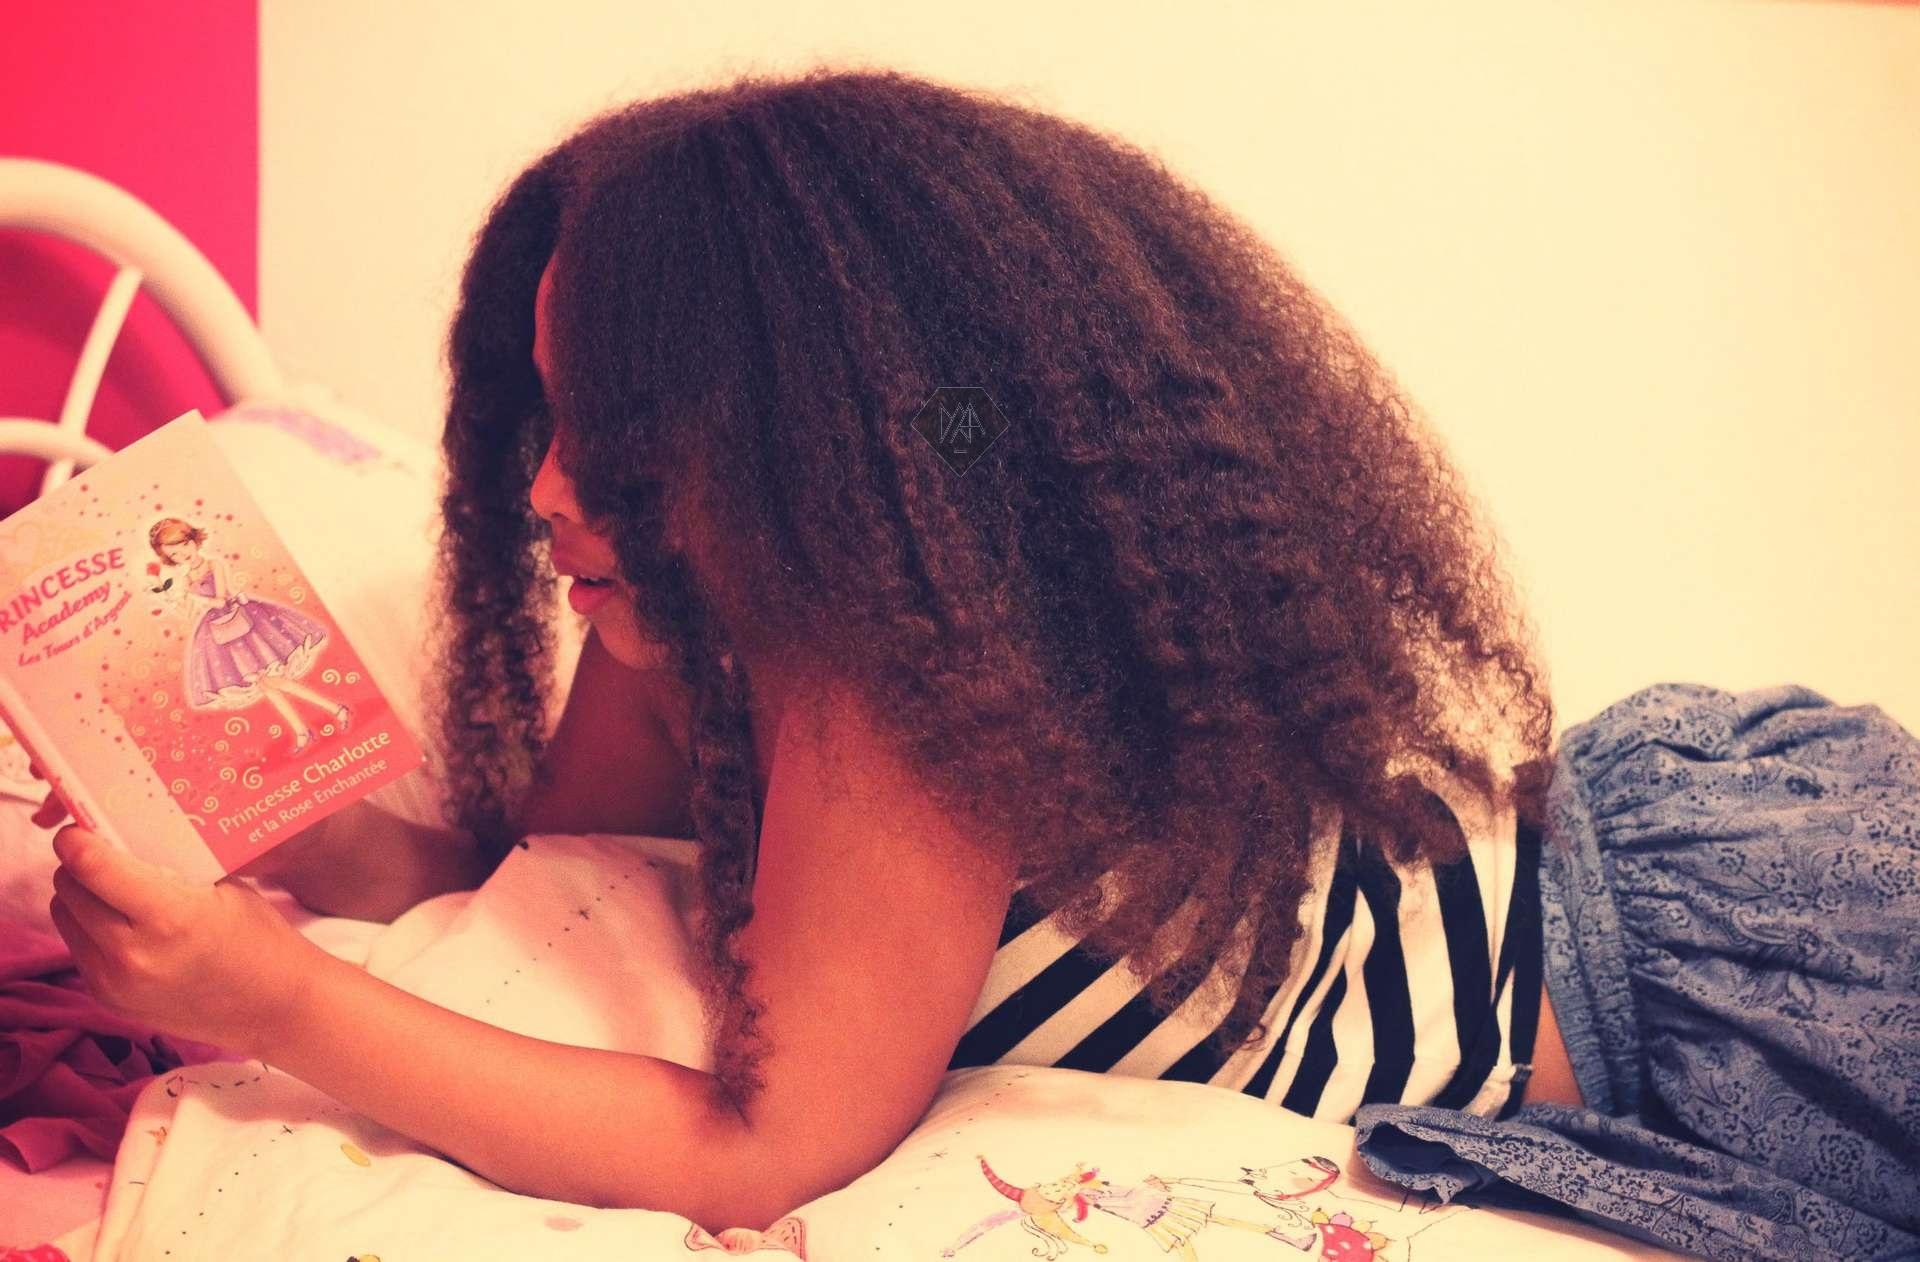 nunaavane-hair-care-natural-kids-hairjourney-curly-mixedkids-curls-naturalhair-choosetobebeautiful